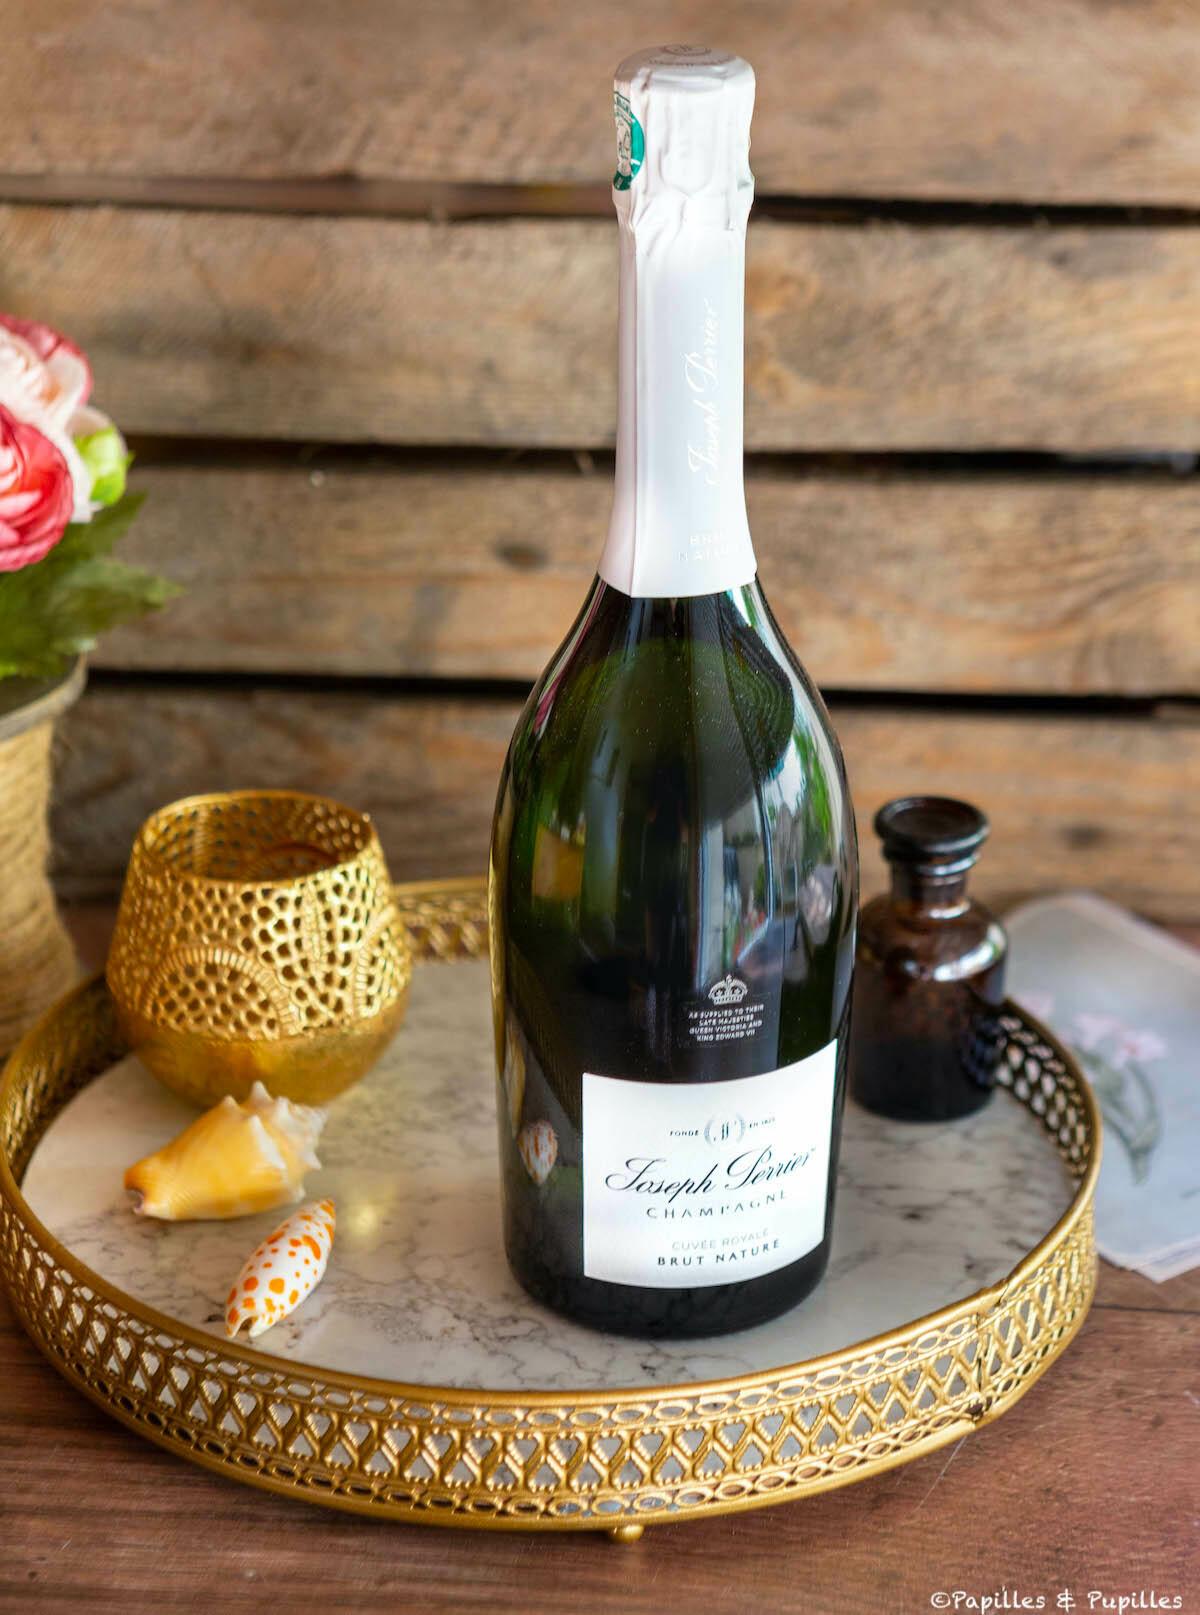 Champagne Joseph Perrier - Cuvée Brut Nature